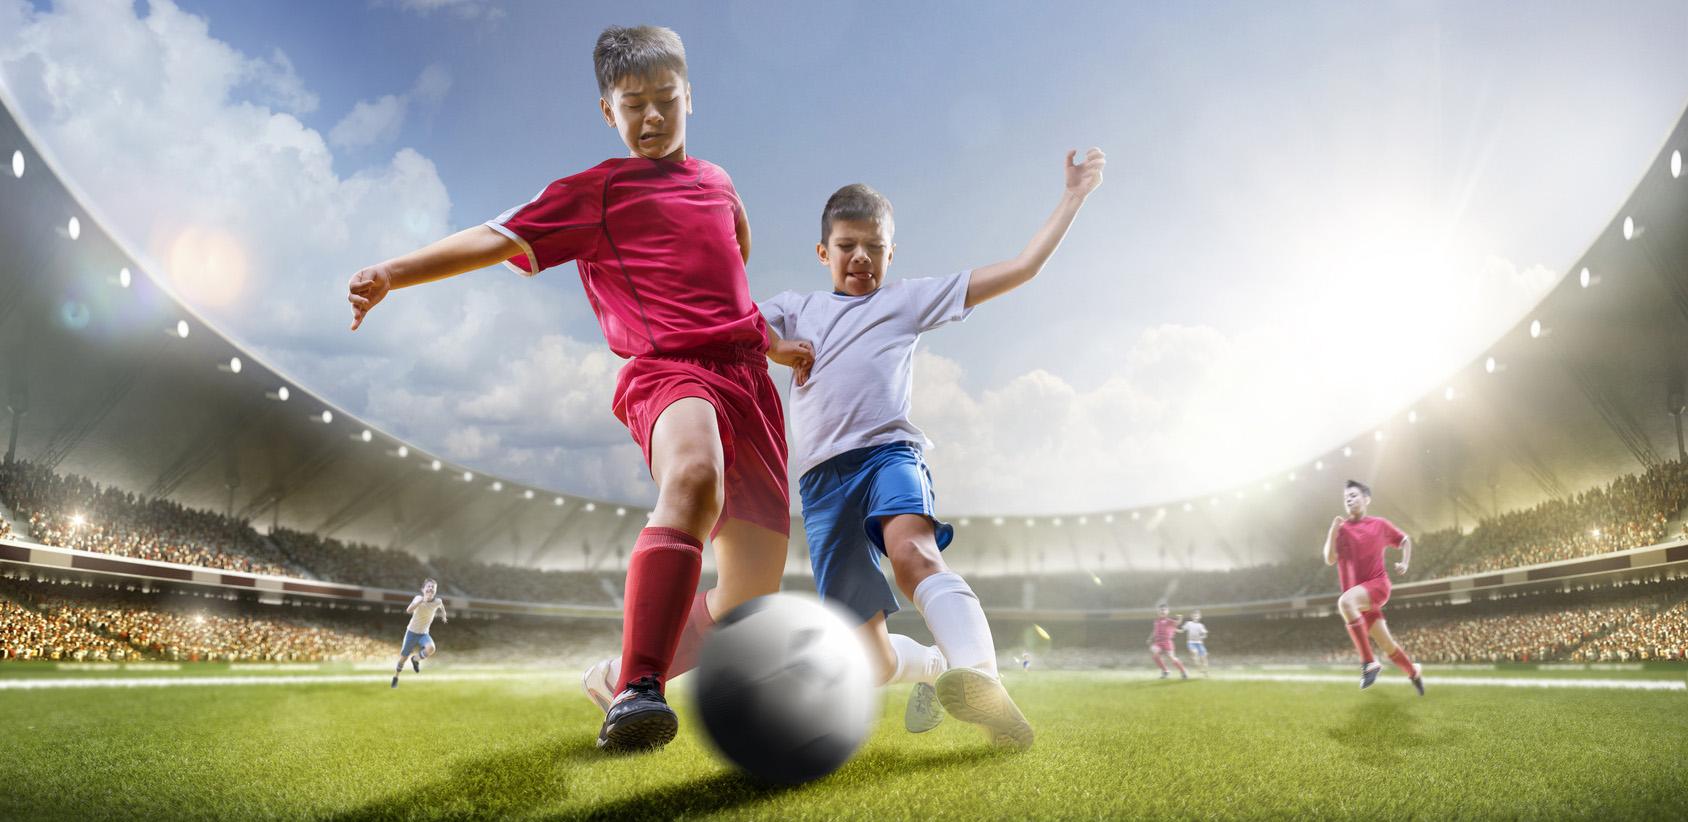 Elitarne obozy piłkarskie